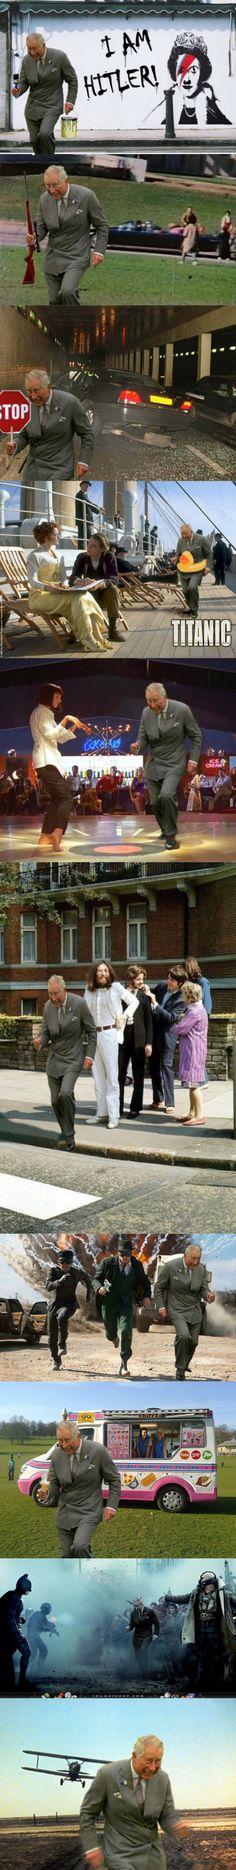 Photoshopped Masters Doing It Right